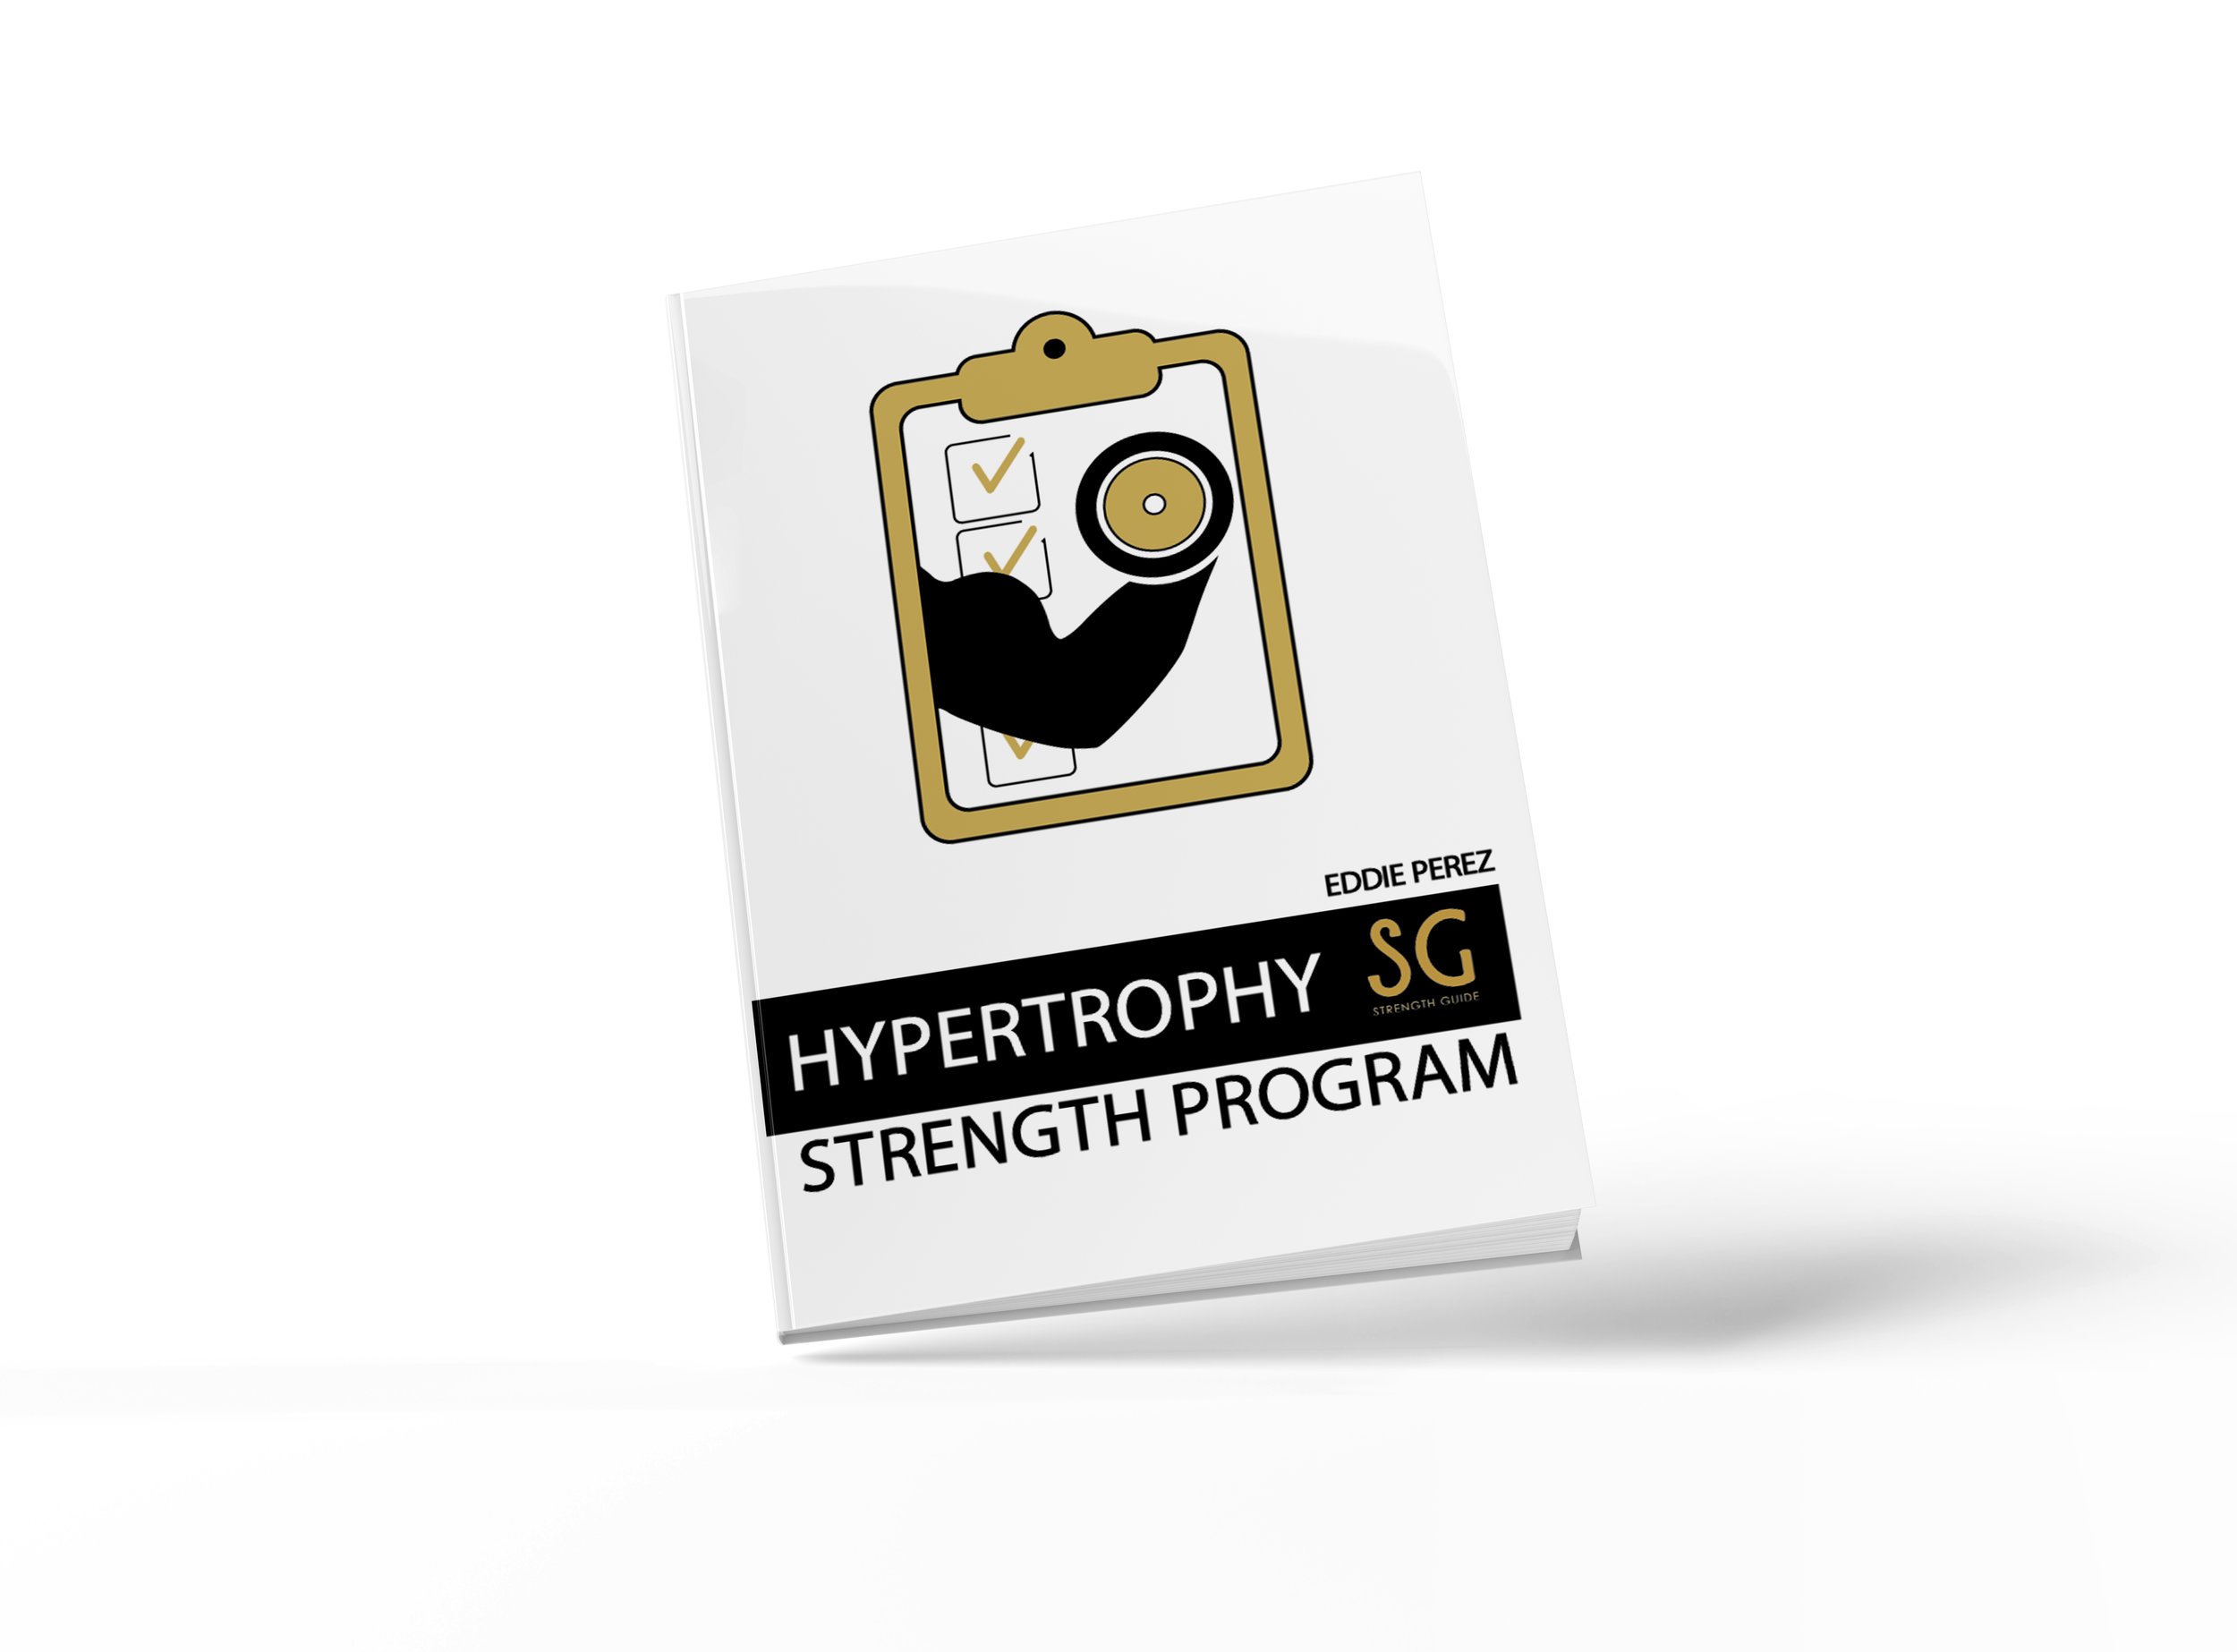 Hypertrophy Strength Program — Strength Guide